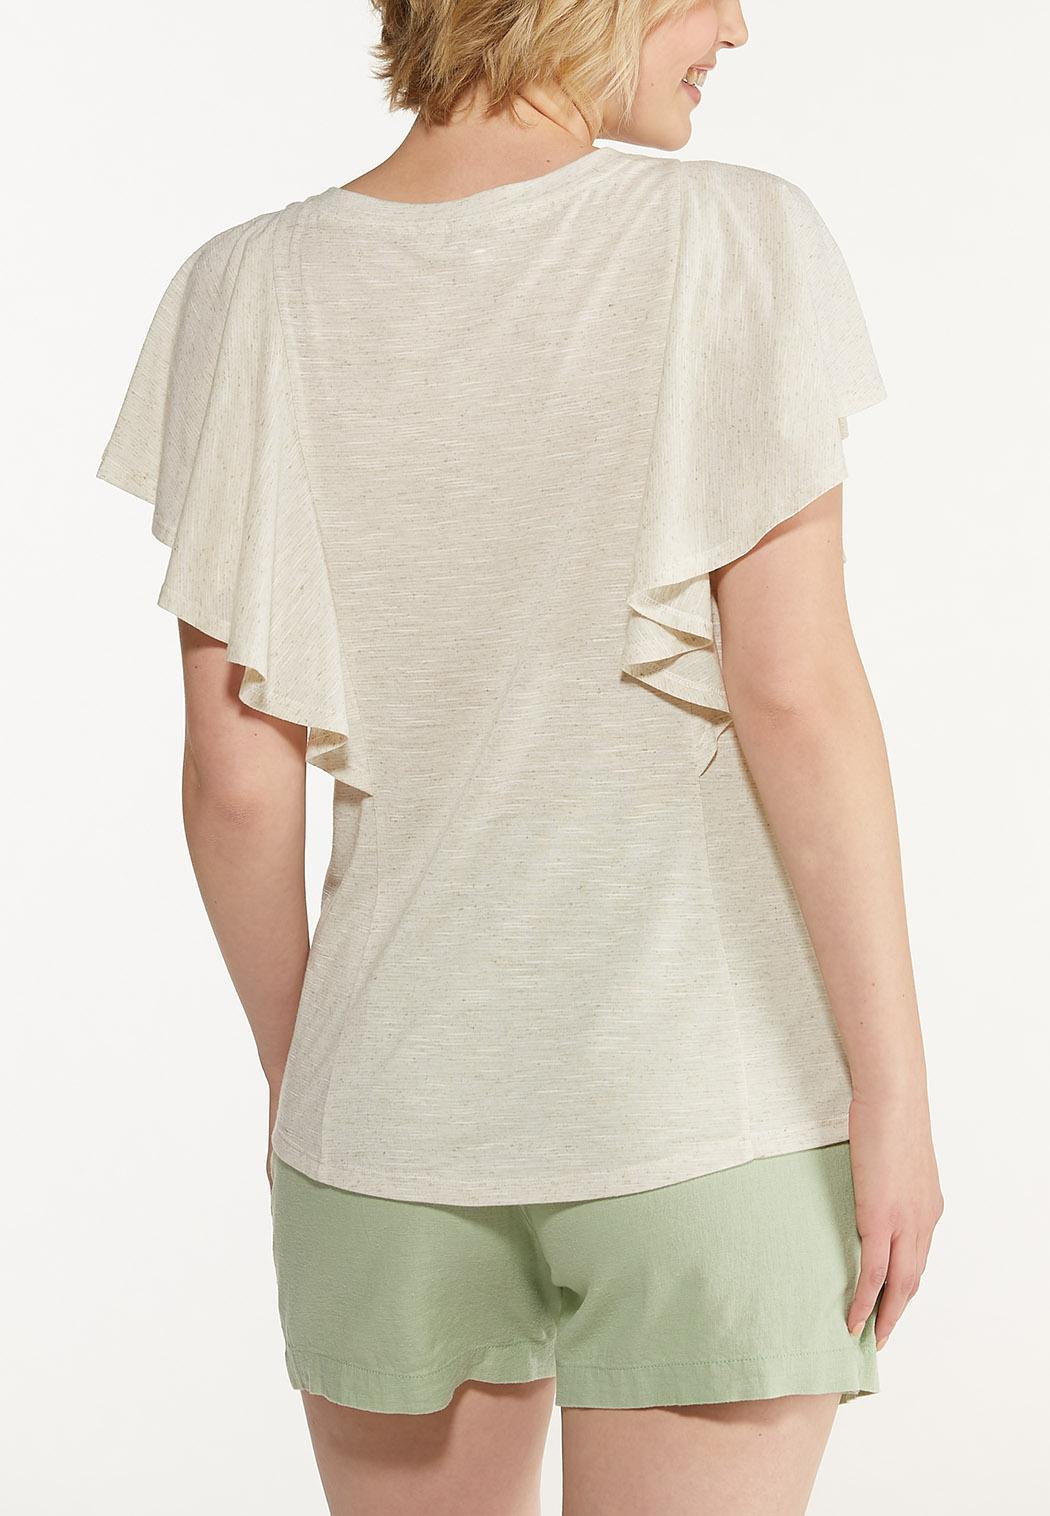 Plus Size Flutter Sleeve Top (Item #44599498)